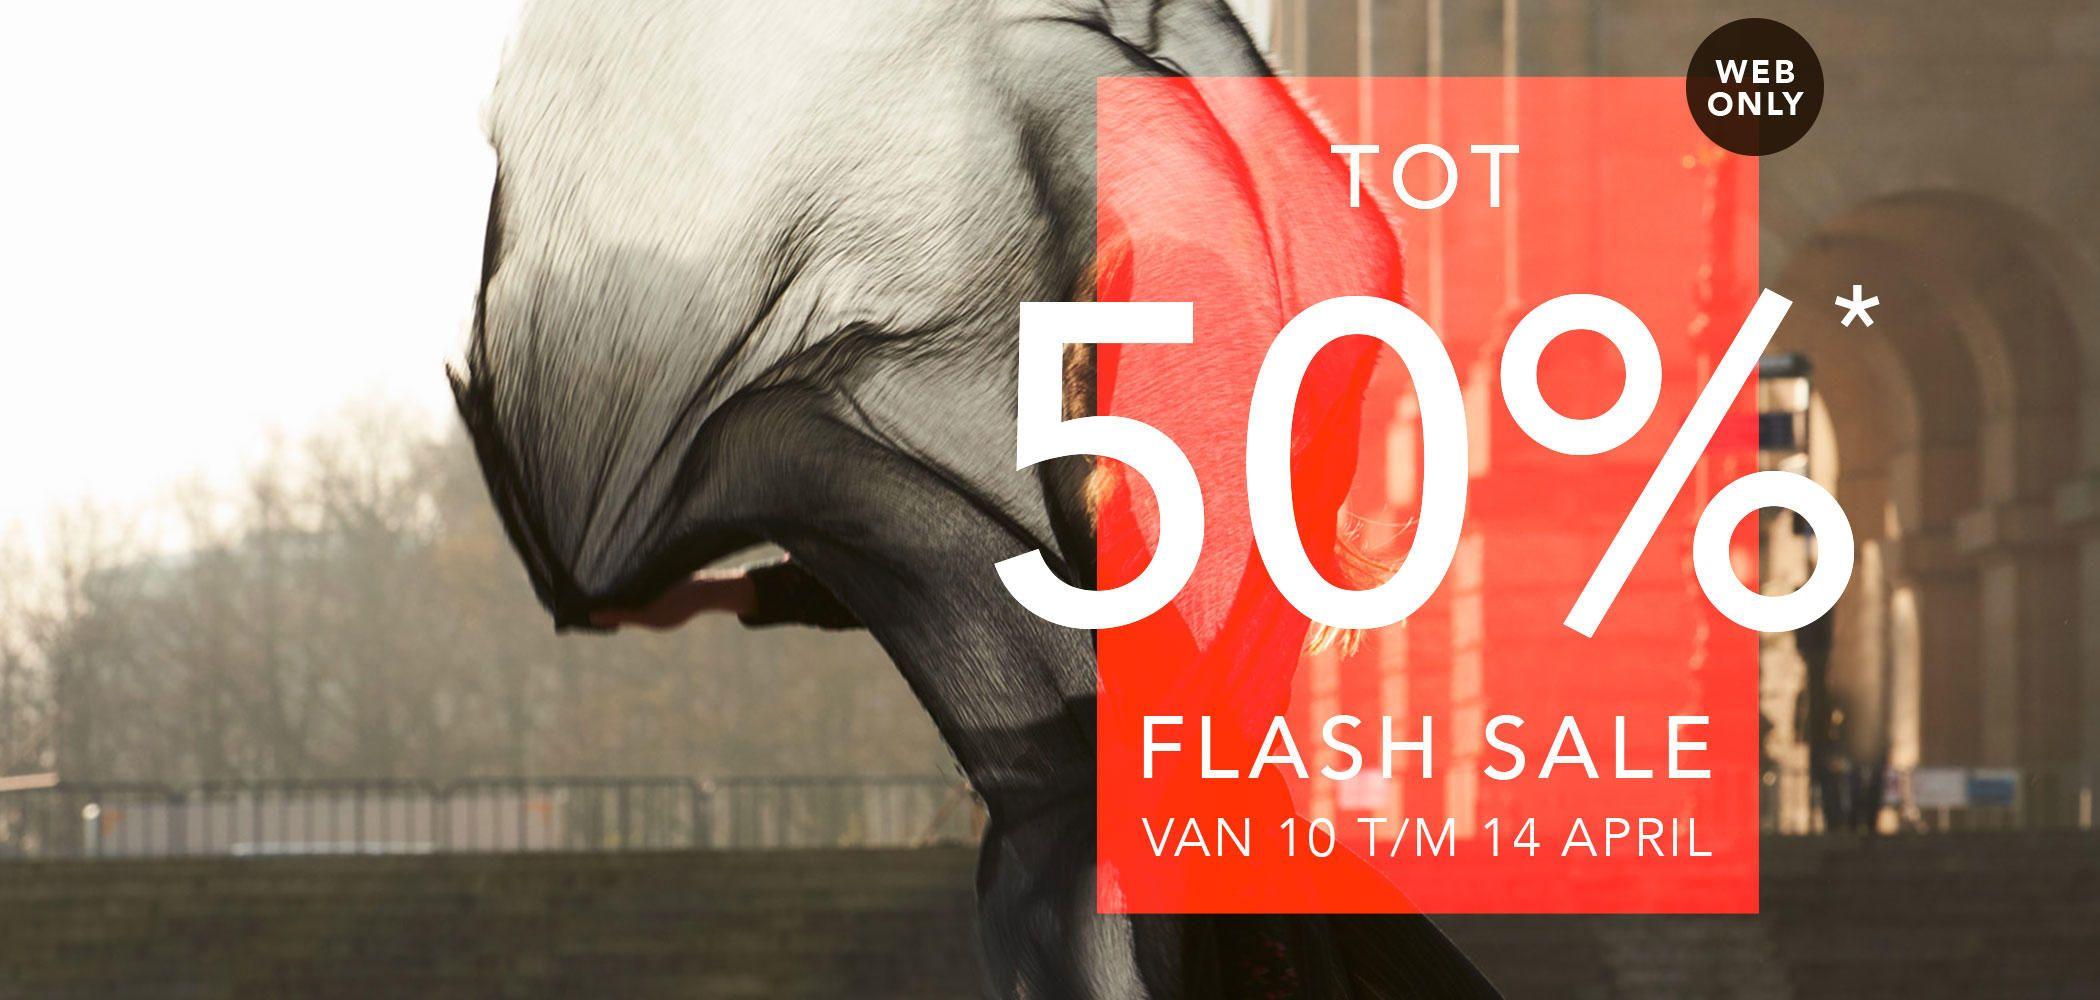 Didi online flash sale - tot 50% korting